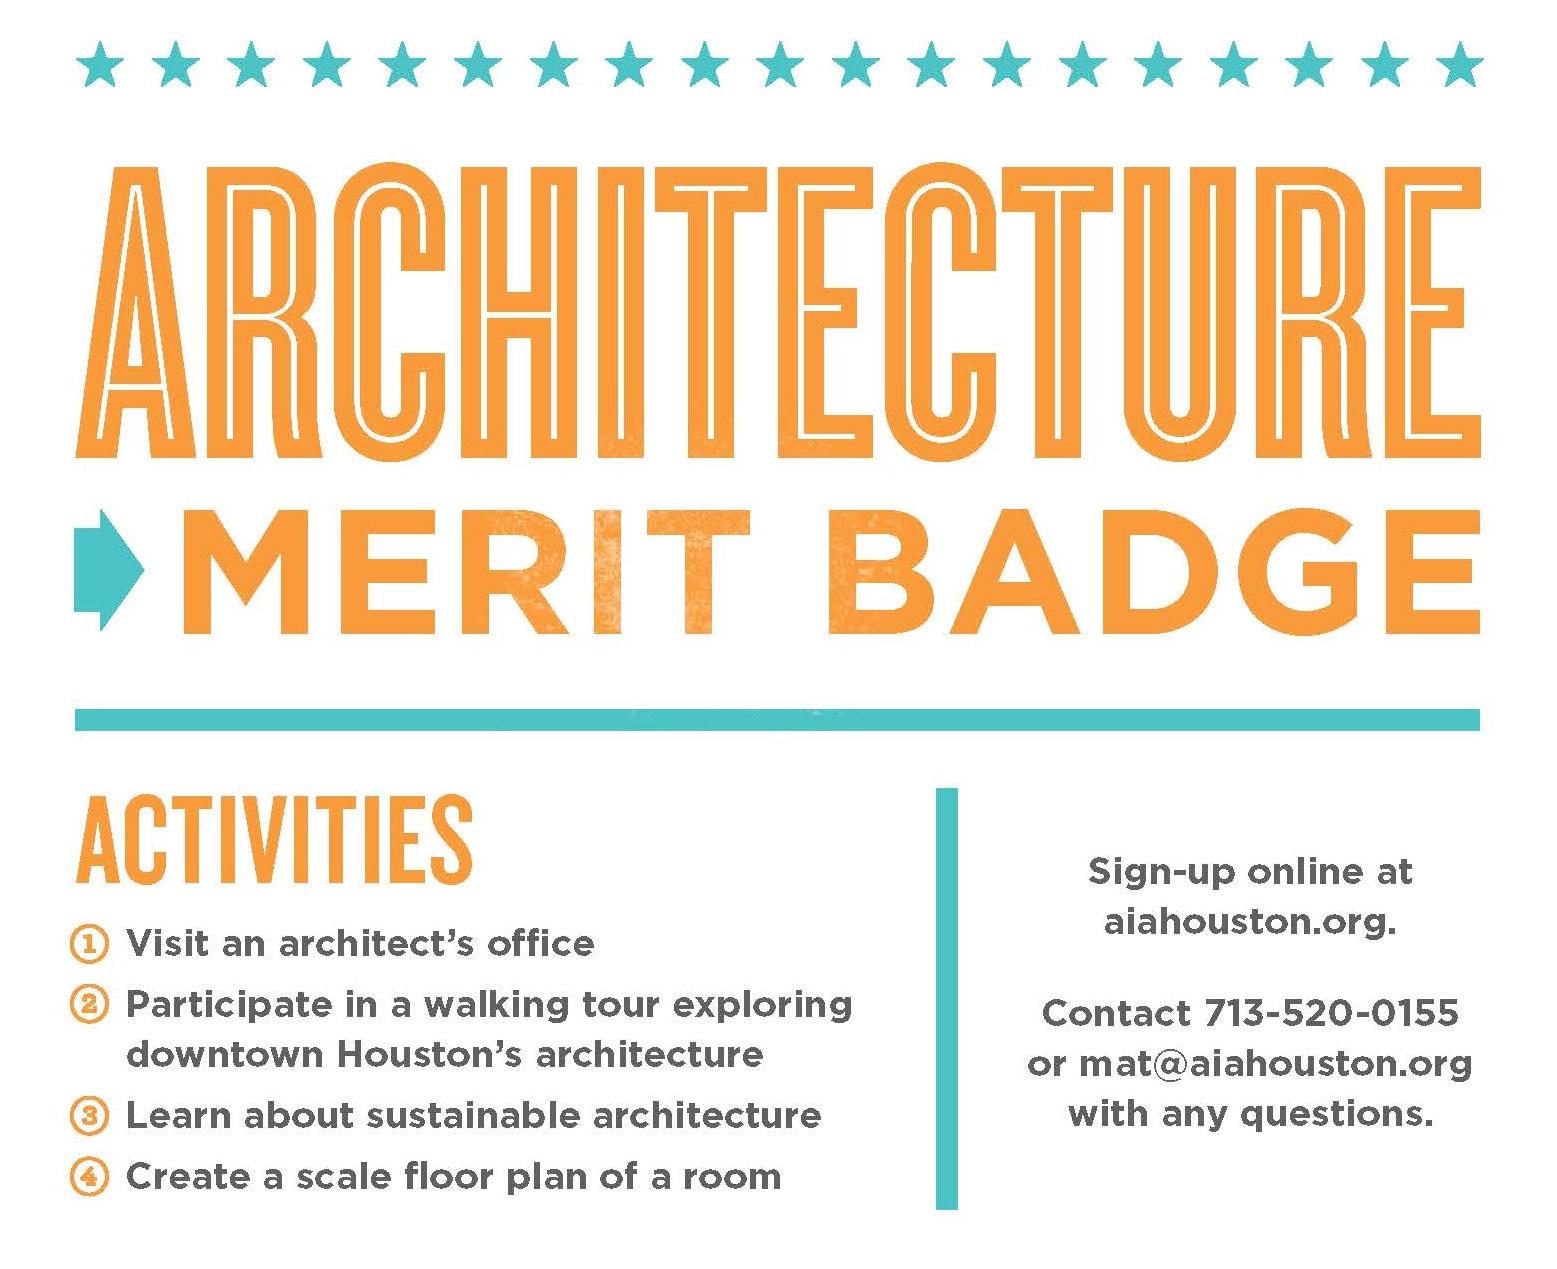 merit badge architecture workshop event events